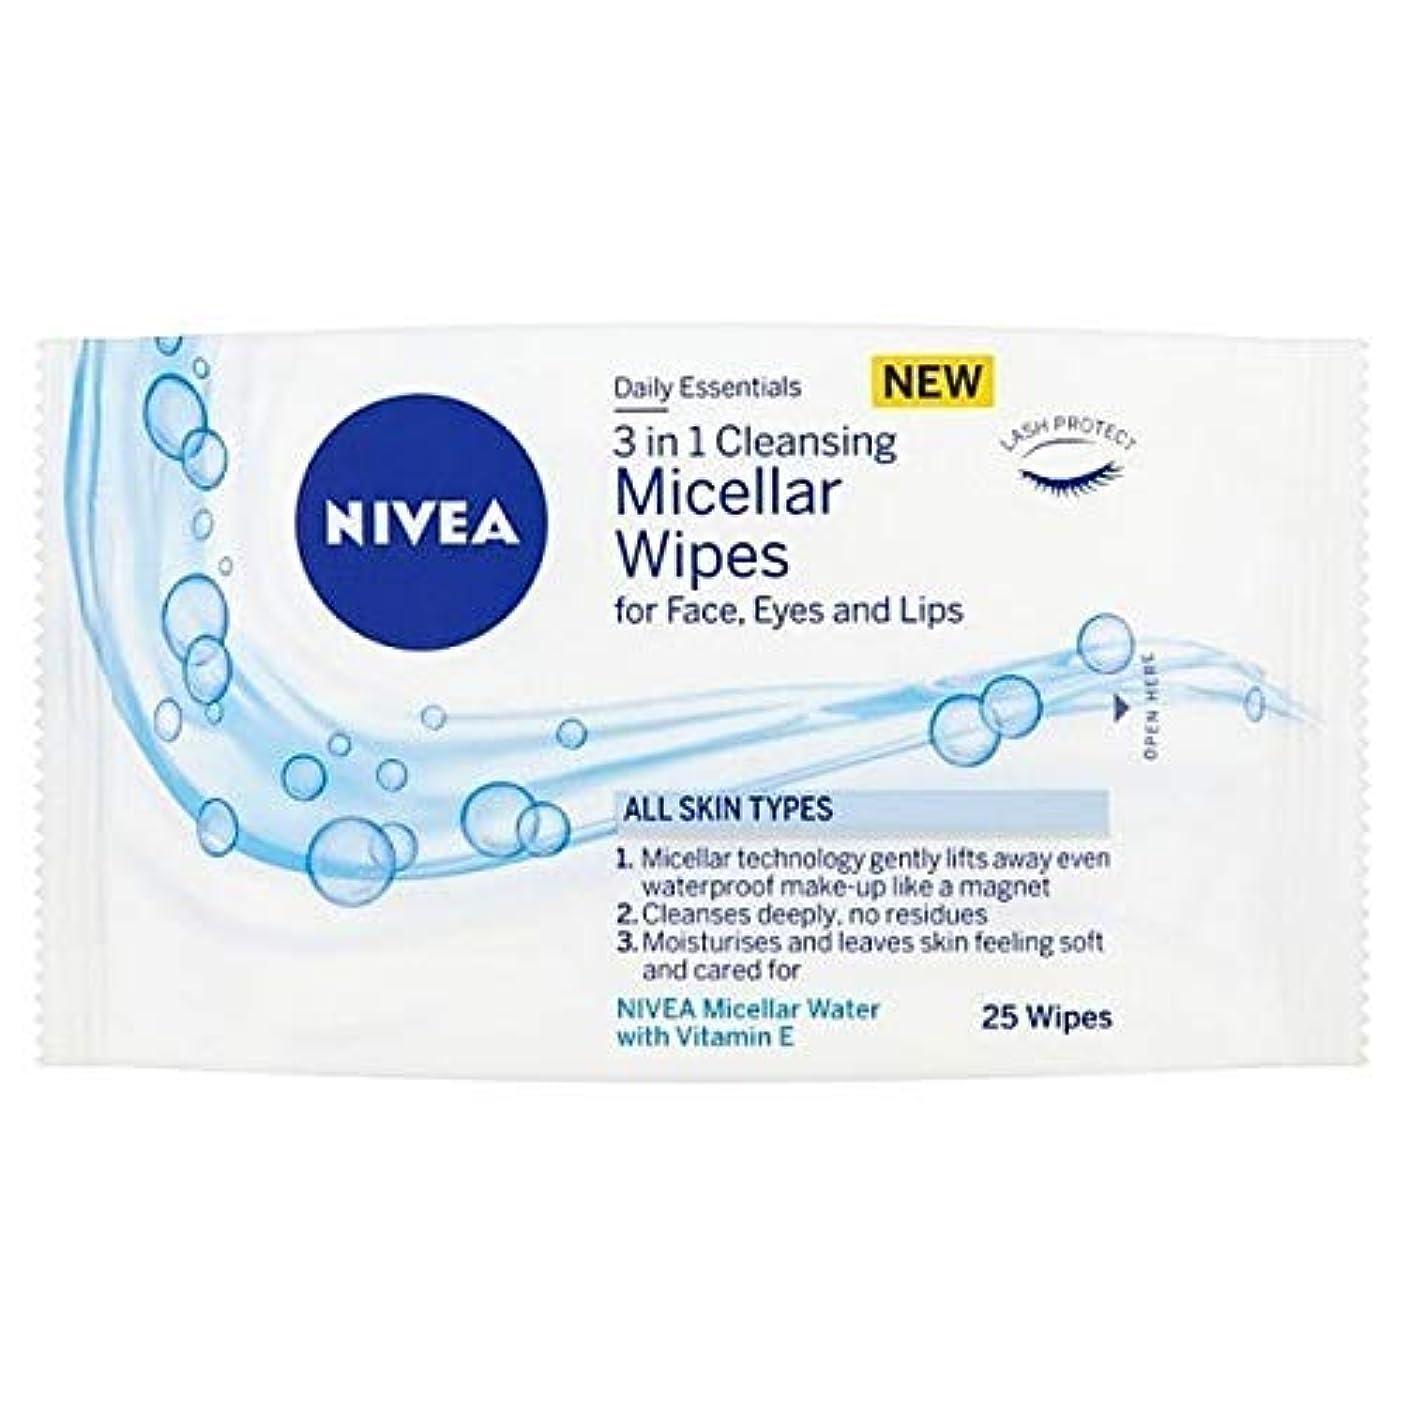 [Nivea ] ニベアミセルクレンジング顔は、25のワイプワイプ - NIVEA Micellar Cleansing Face Wipes, 25 wipes [並行輸入品]